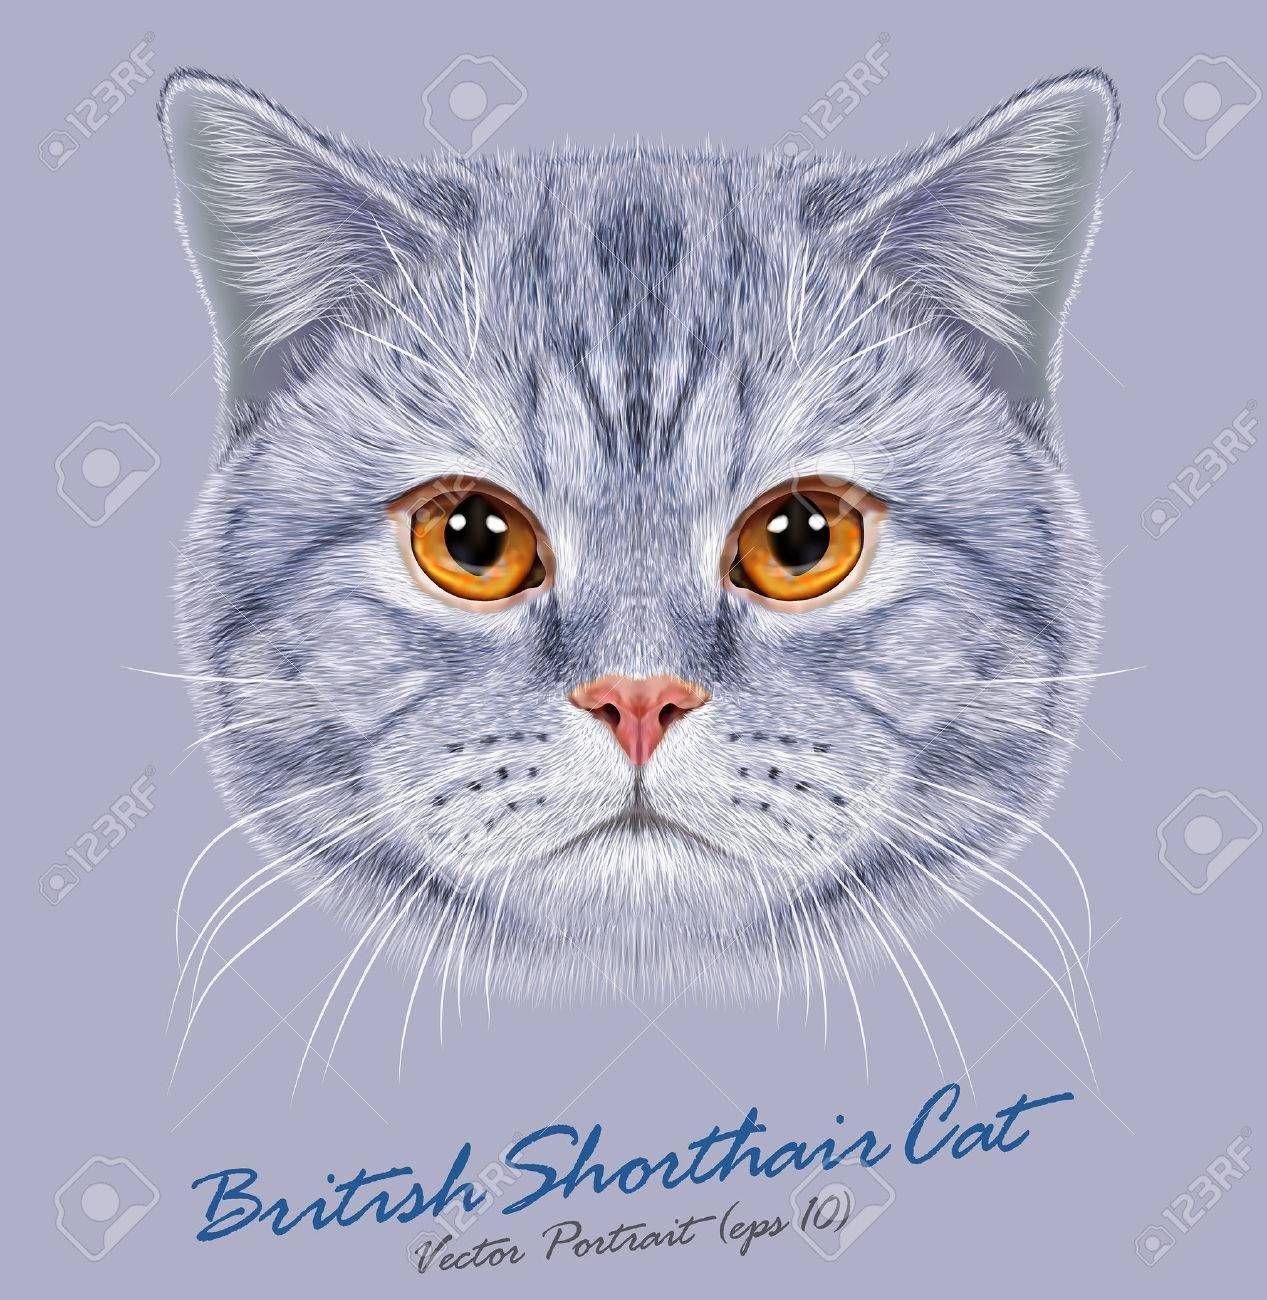 Vector Retrato De British Gato Corto Cabello Lindo Gato Doméstico Gris Con Ojos De Color Naranja Short Hair Cats Cats Domestic Cat